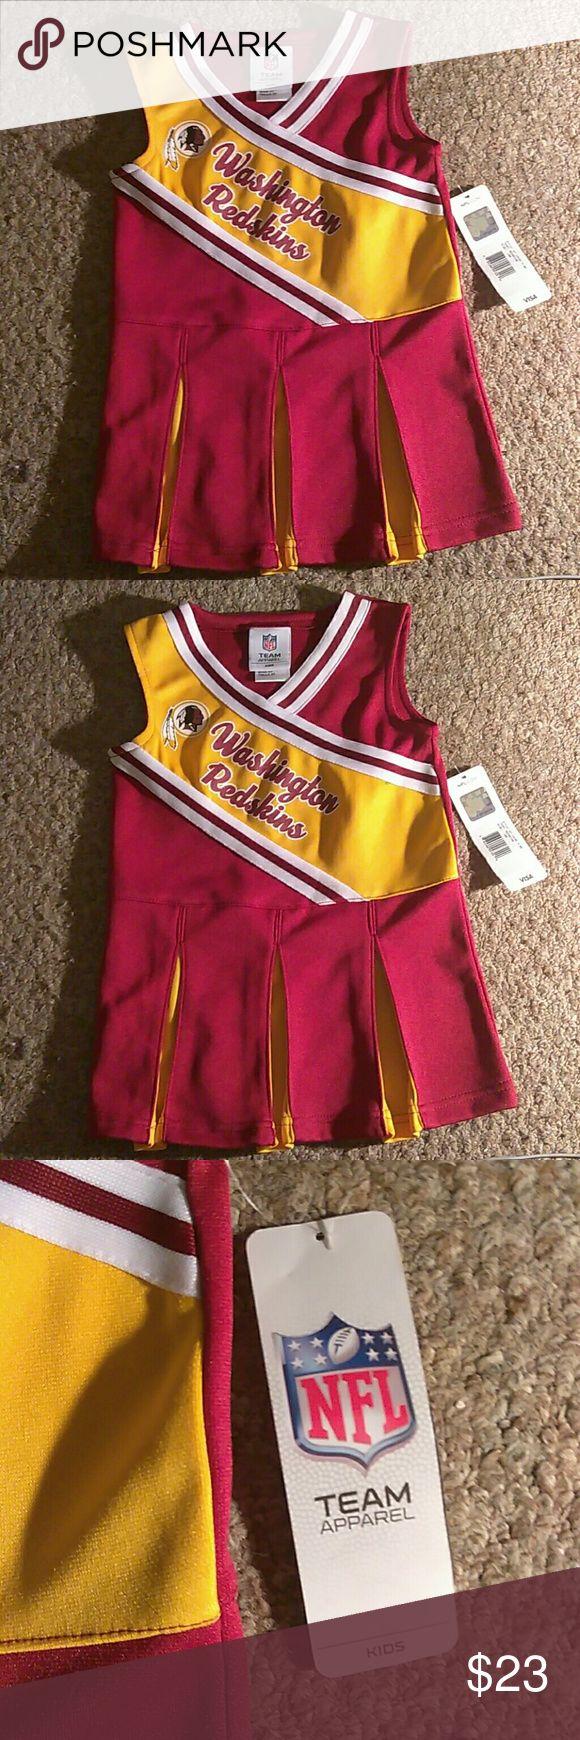 Redskin Cheerleader dres 3T Washington Redskin Cheerleader dress nfl team apparel Dresses Formal